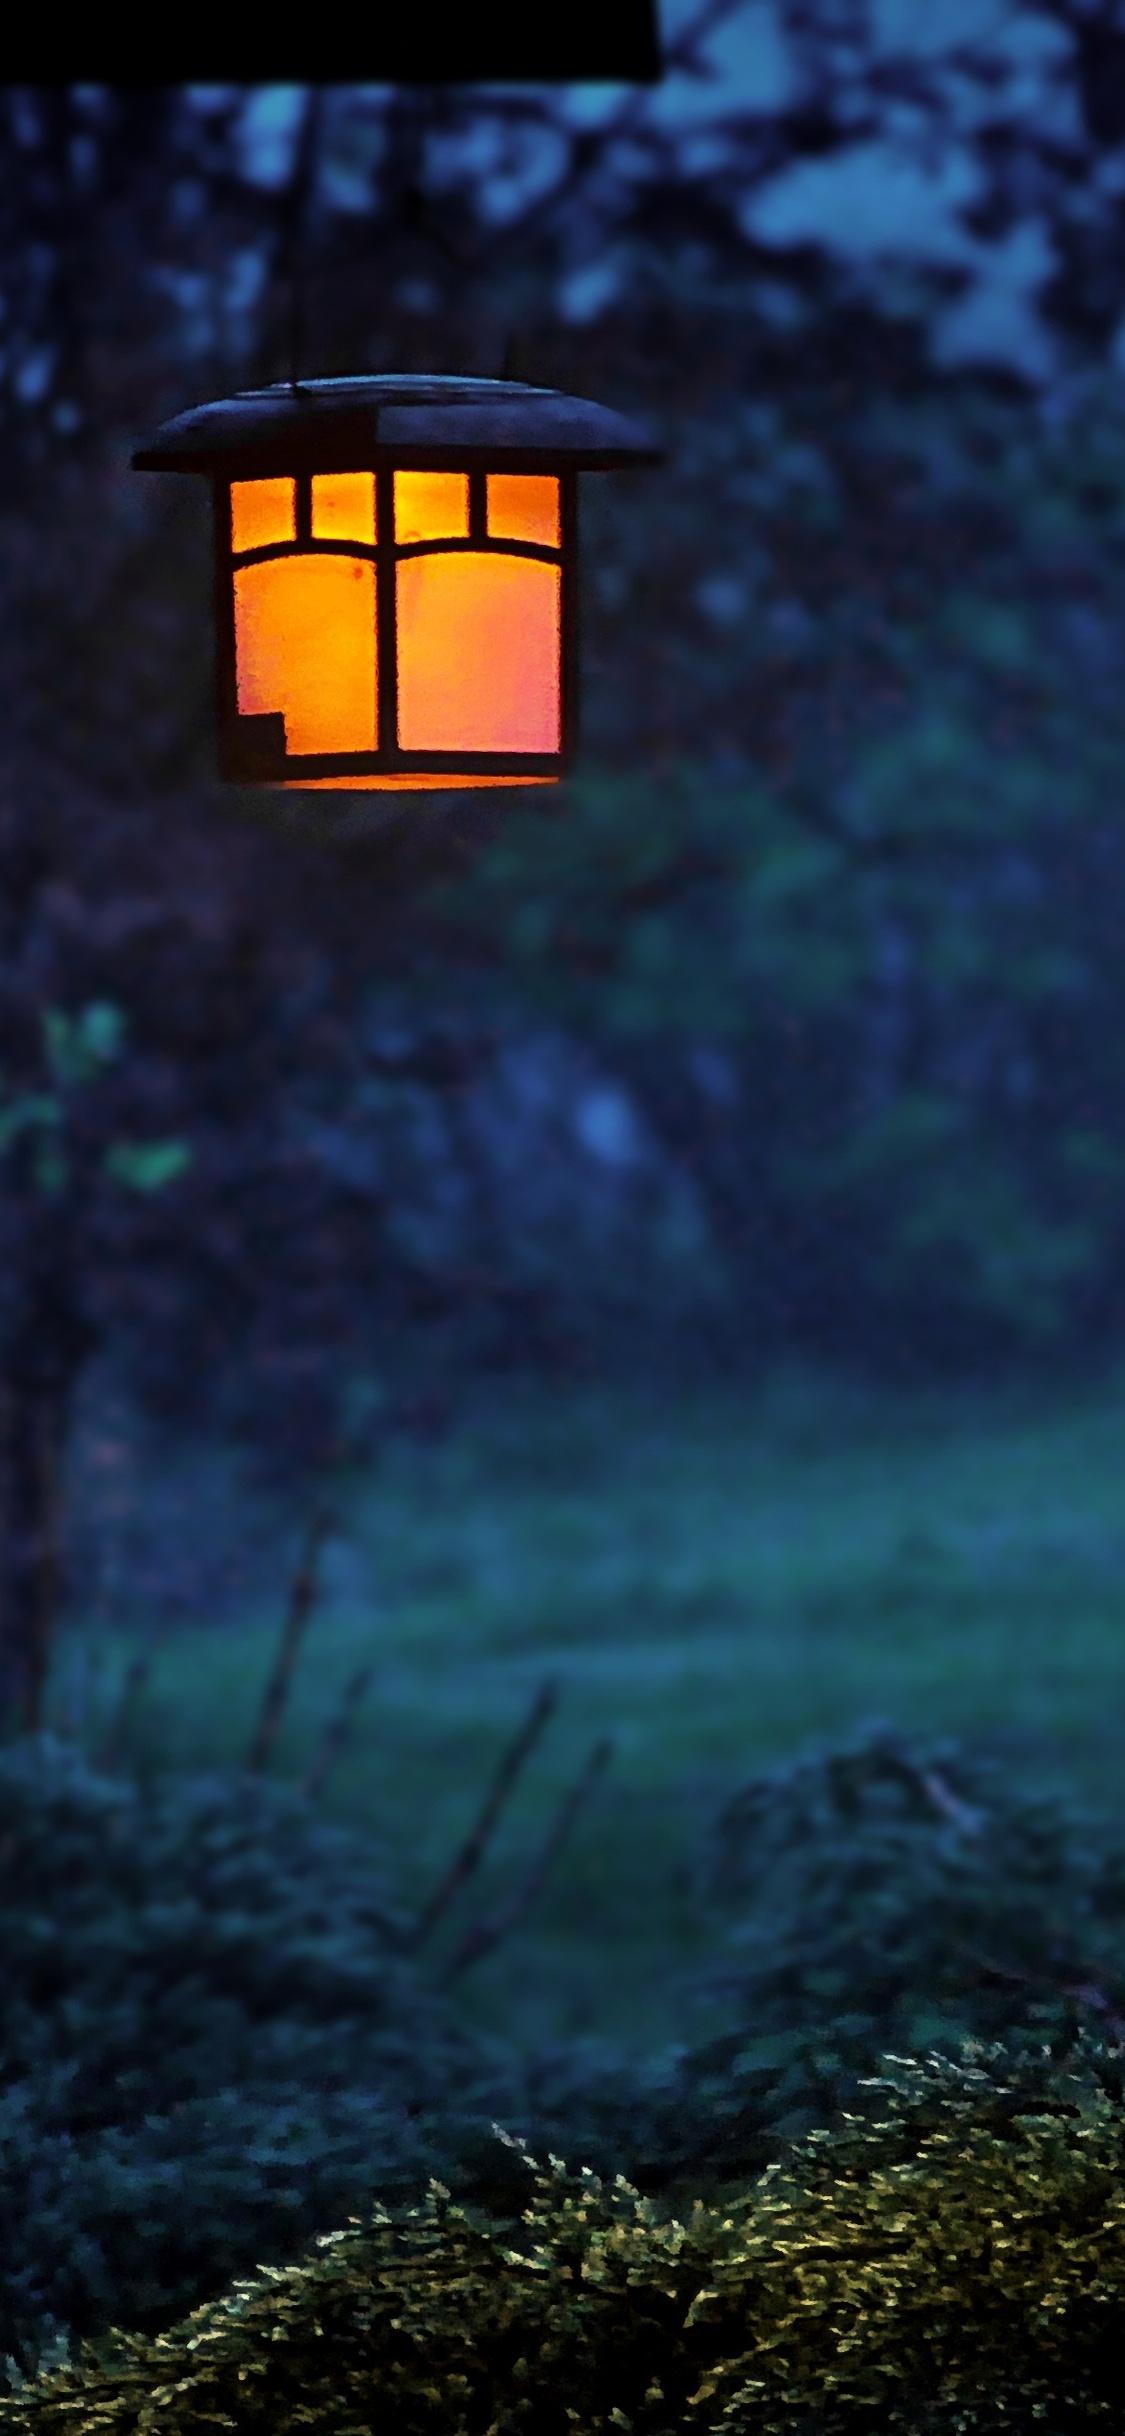 twilight-lamp-evening-outdoors-c7.jpg